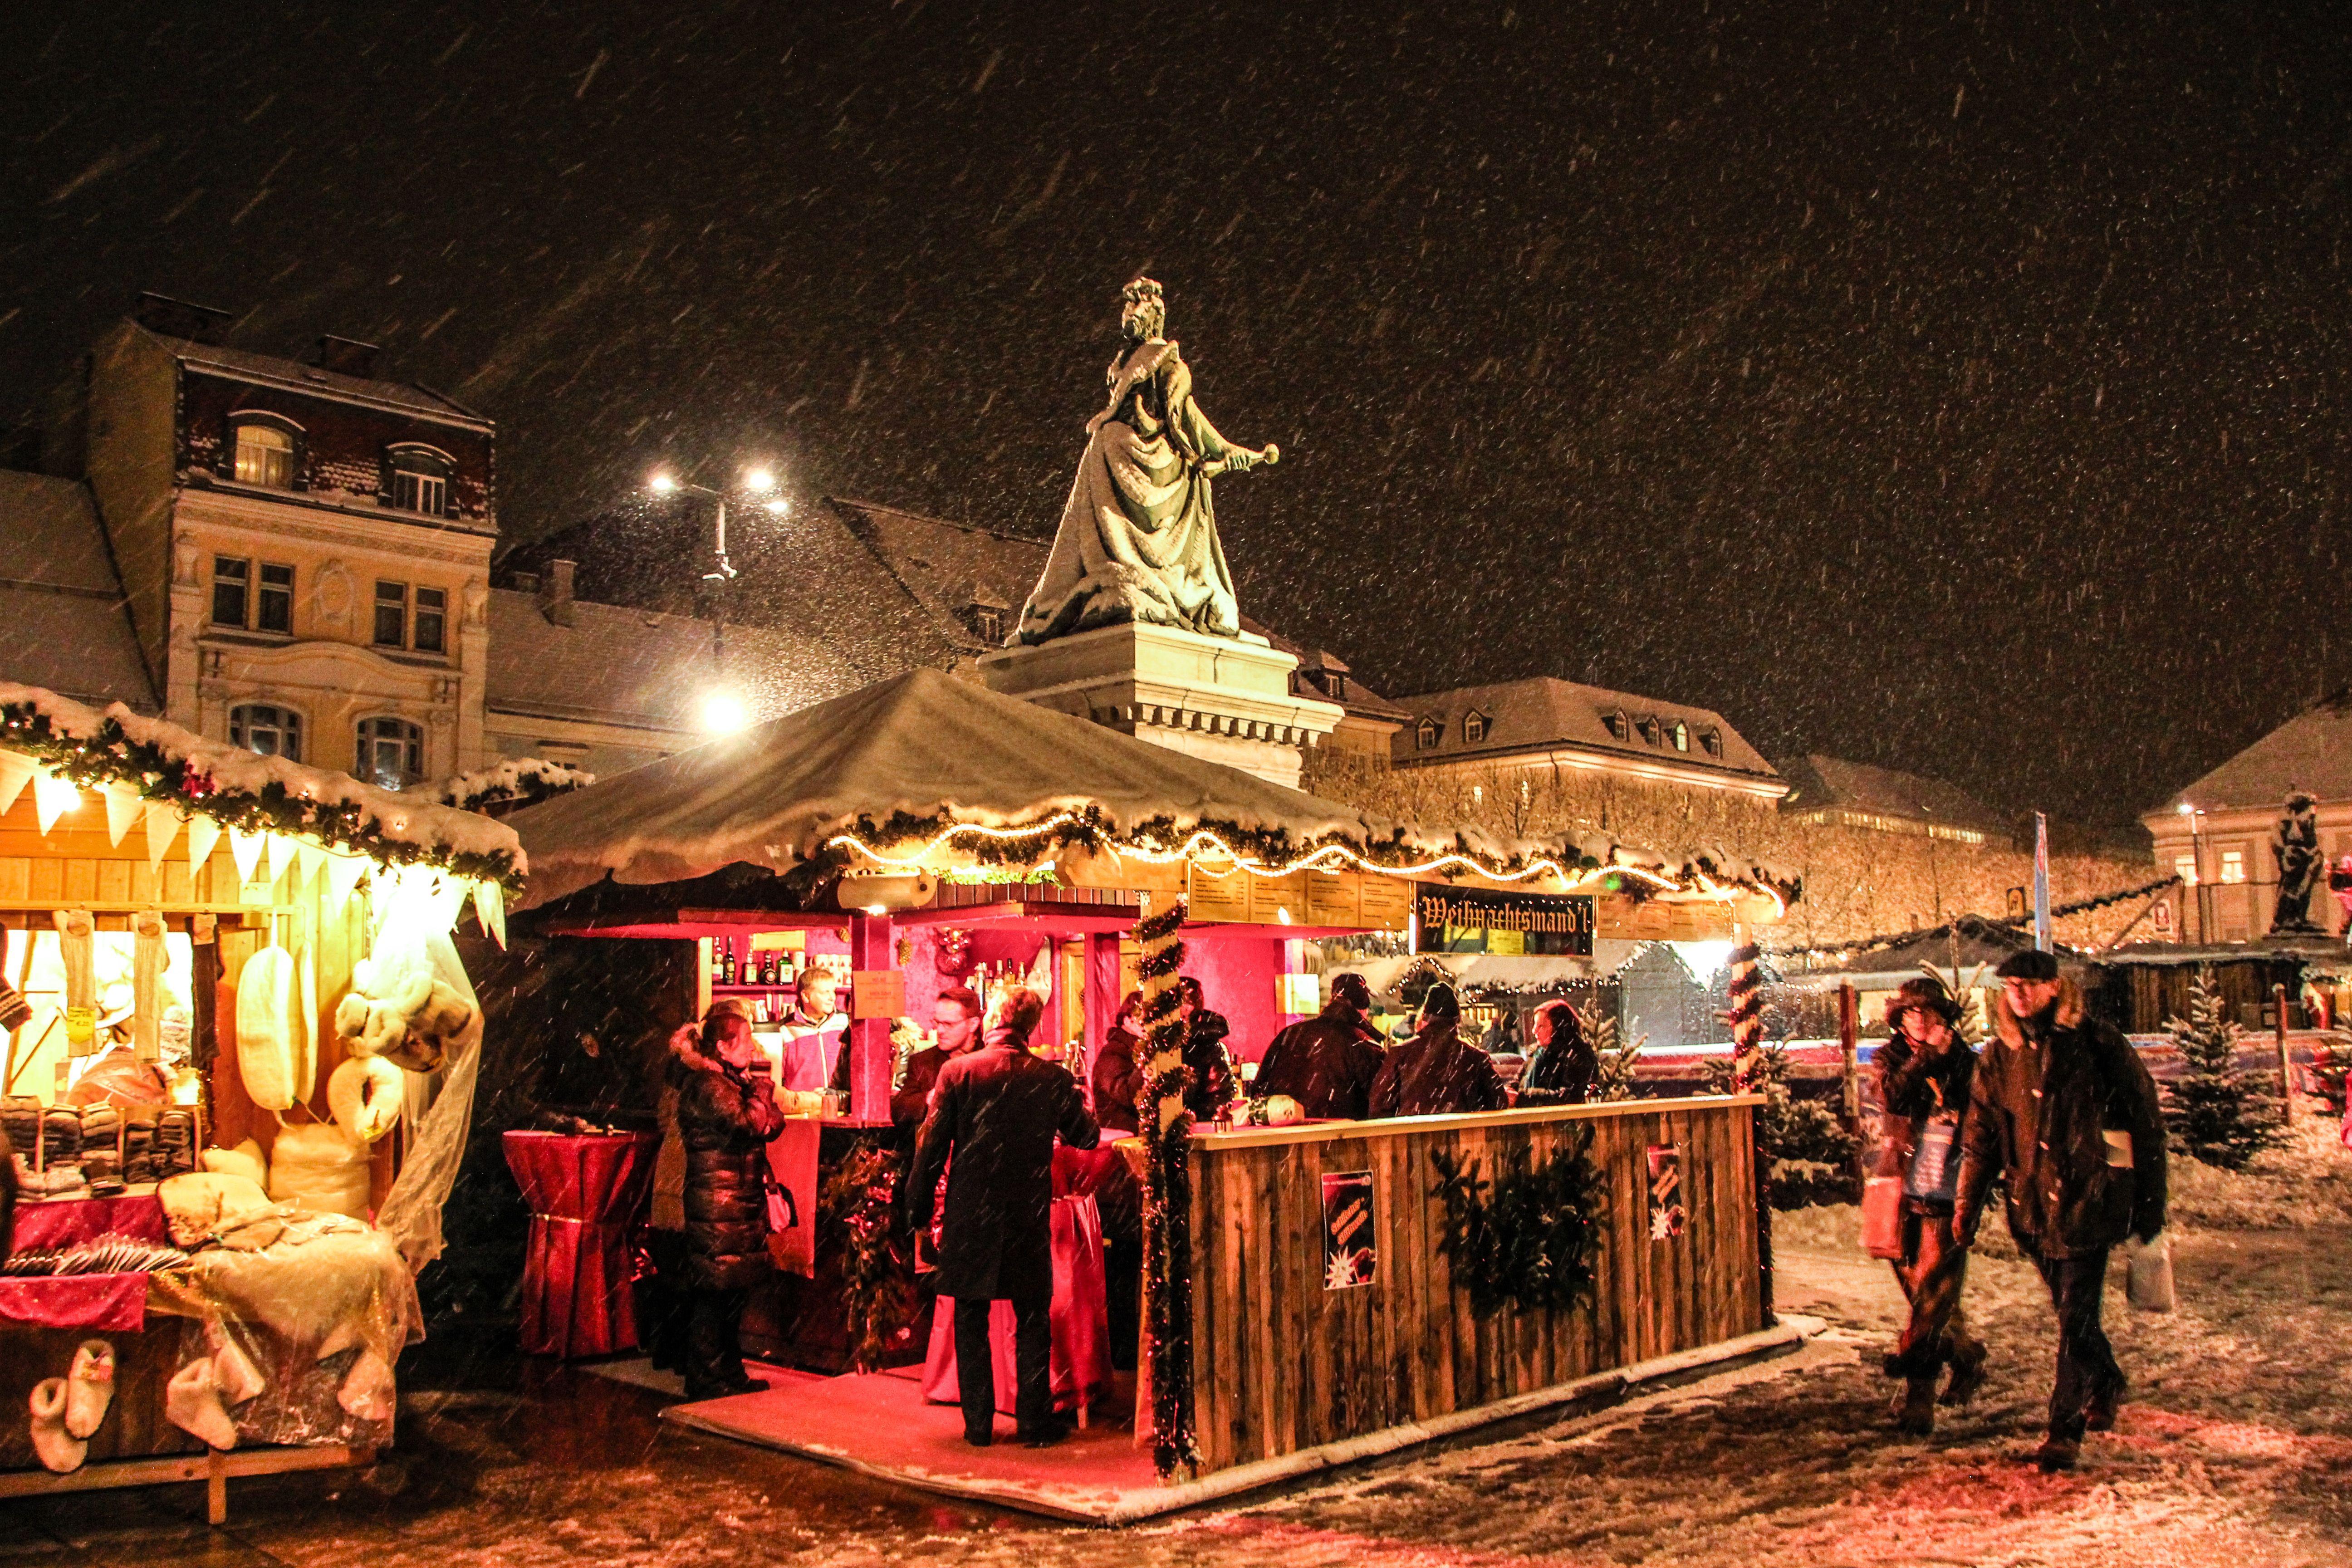 Christmas market in Klagenfurt am Wörthersee. Photo: Wolfgang Handler/Pixelpoint